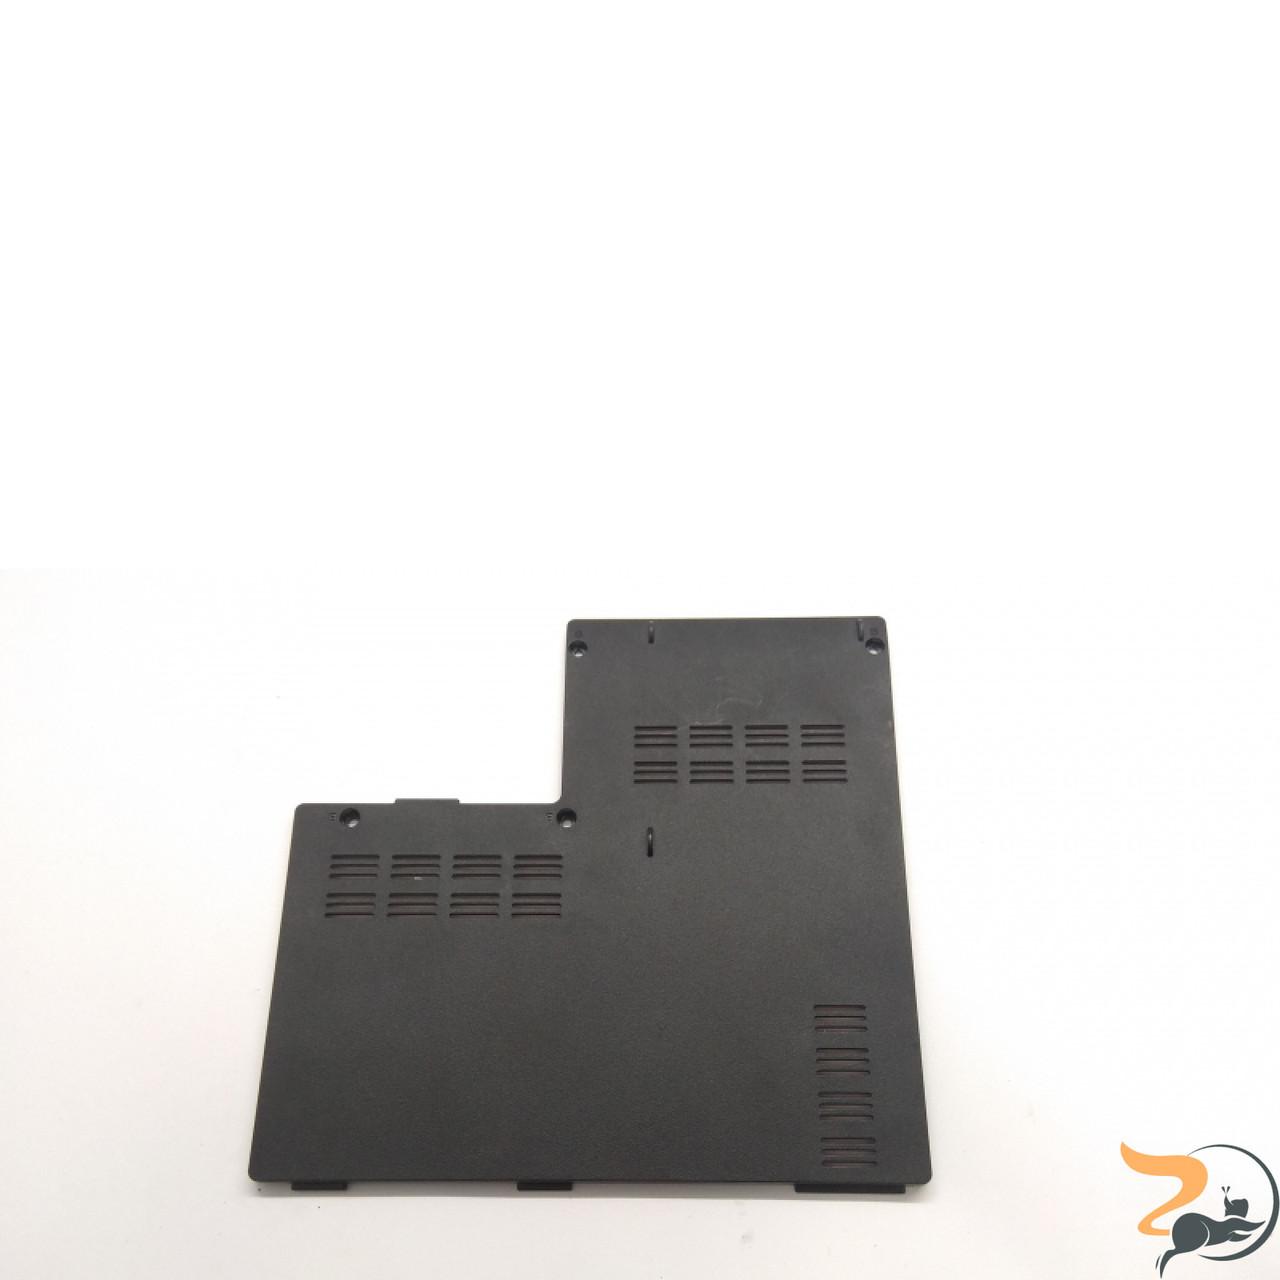 Сервісна кришка для ноутбука Asus K72D, 13GNZW10P050-1,13N0-JWA0501, 13GNZW1AP050-1.